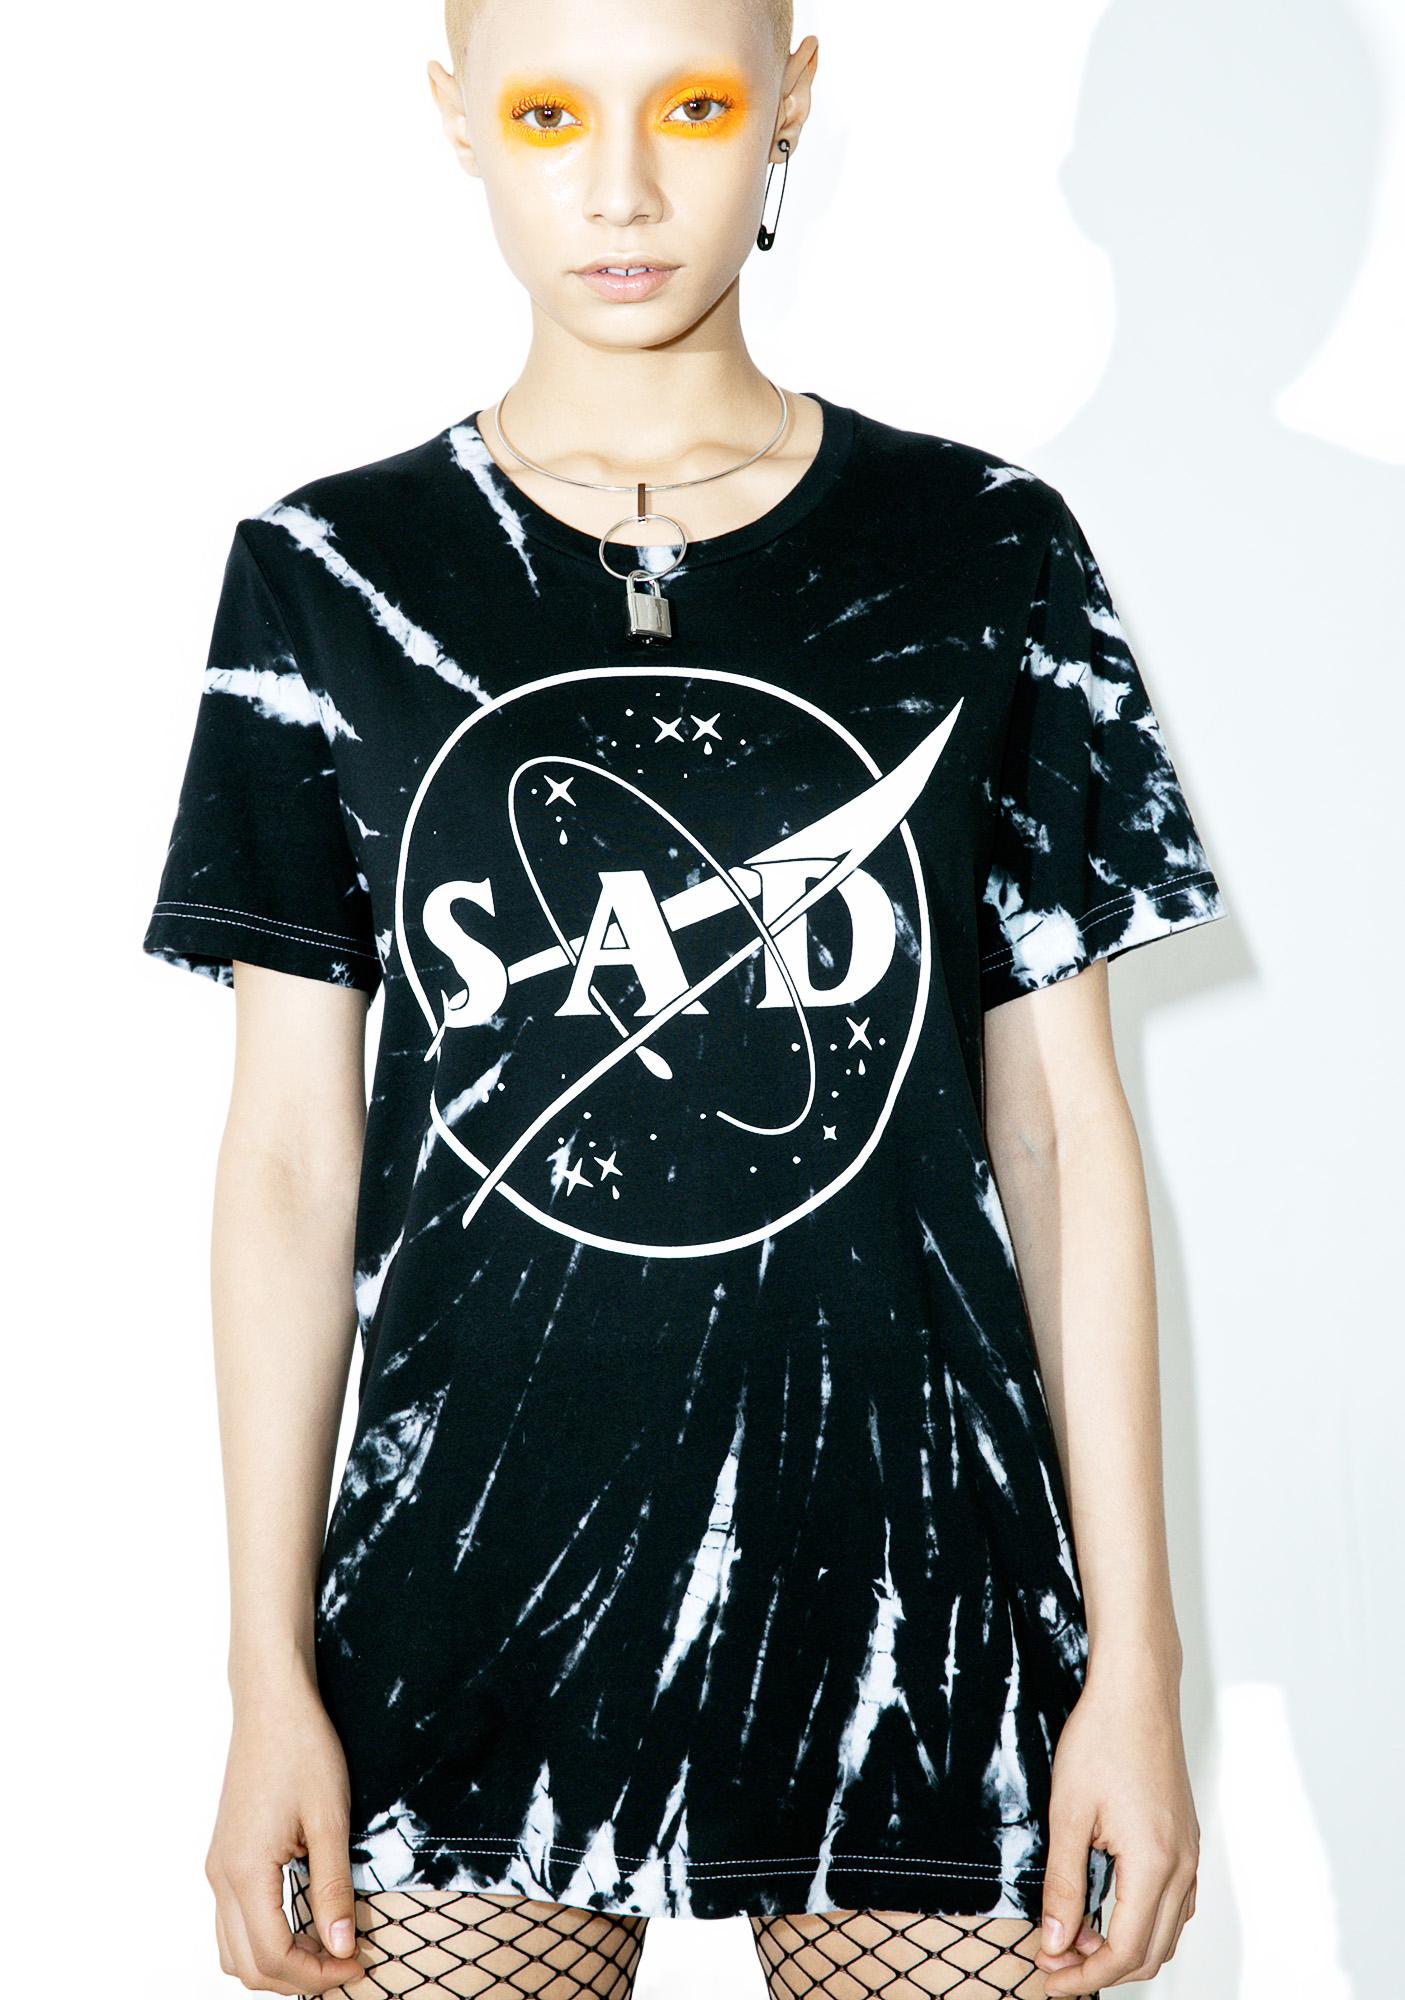 Sad Boy Crew SadSpace #Customs Tee